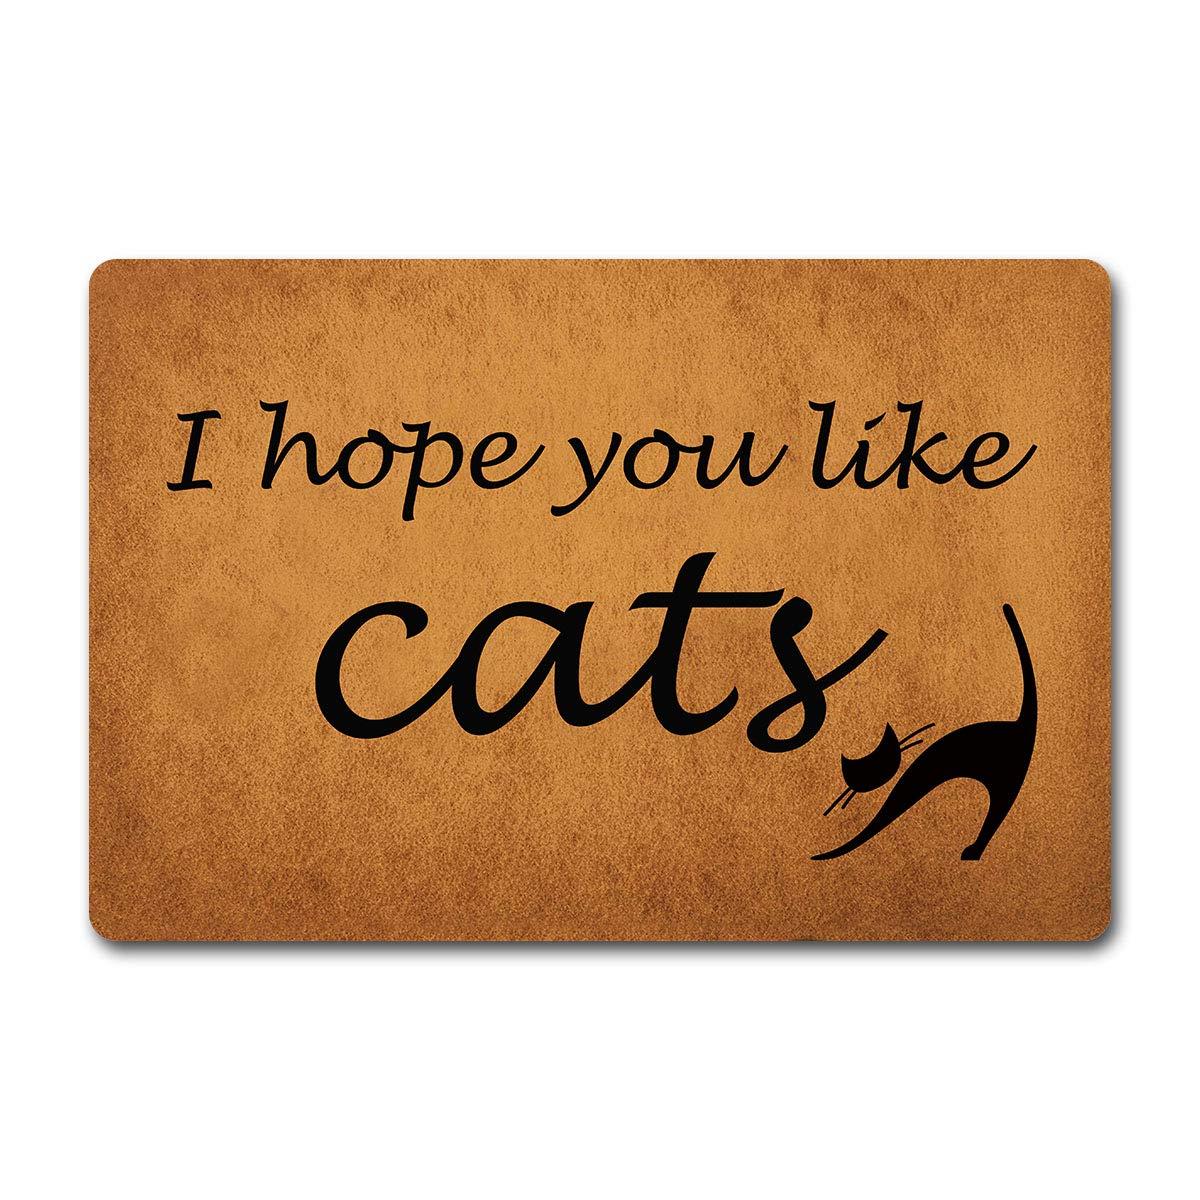 "ST Entrance Door Mats I Hope You Like Cats Monogram Funny Welcome mat for Entrance Way Outdoor/Indoor Bathroom/Kitchen Anti-Slip Rubber Rugs Custom Doormat 23.6""(W) X 15.7""(L)"